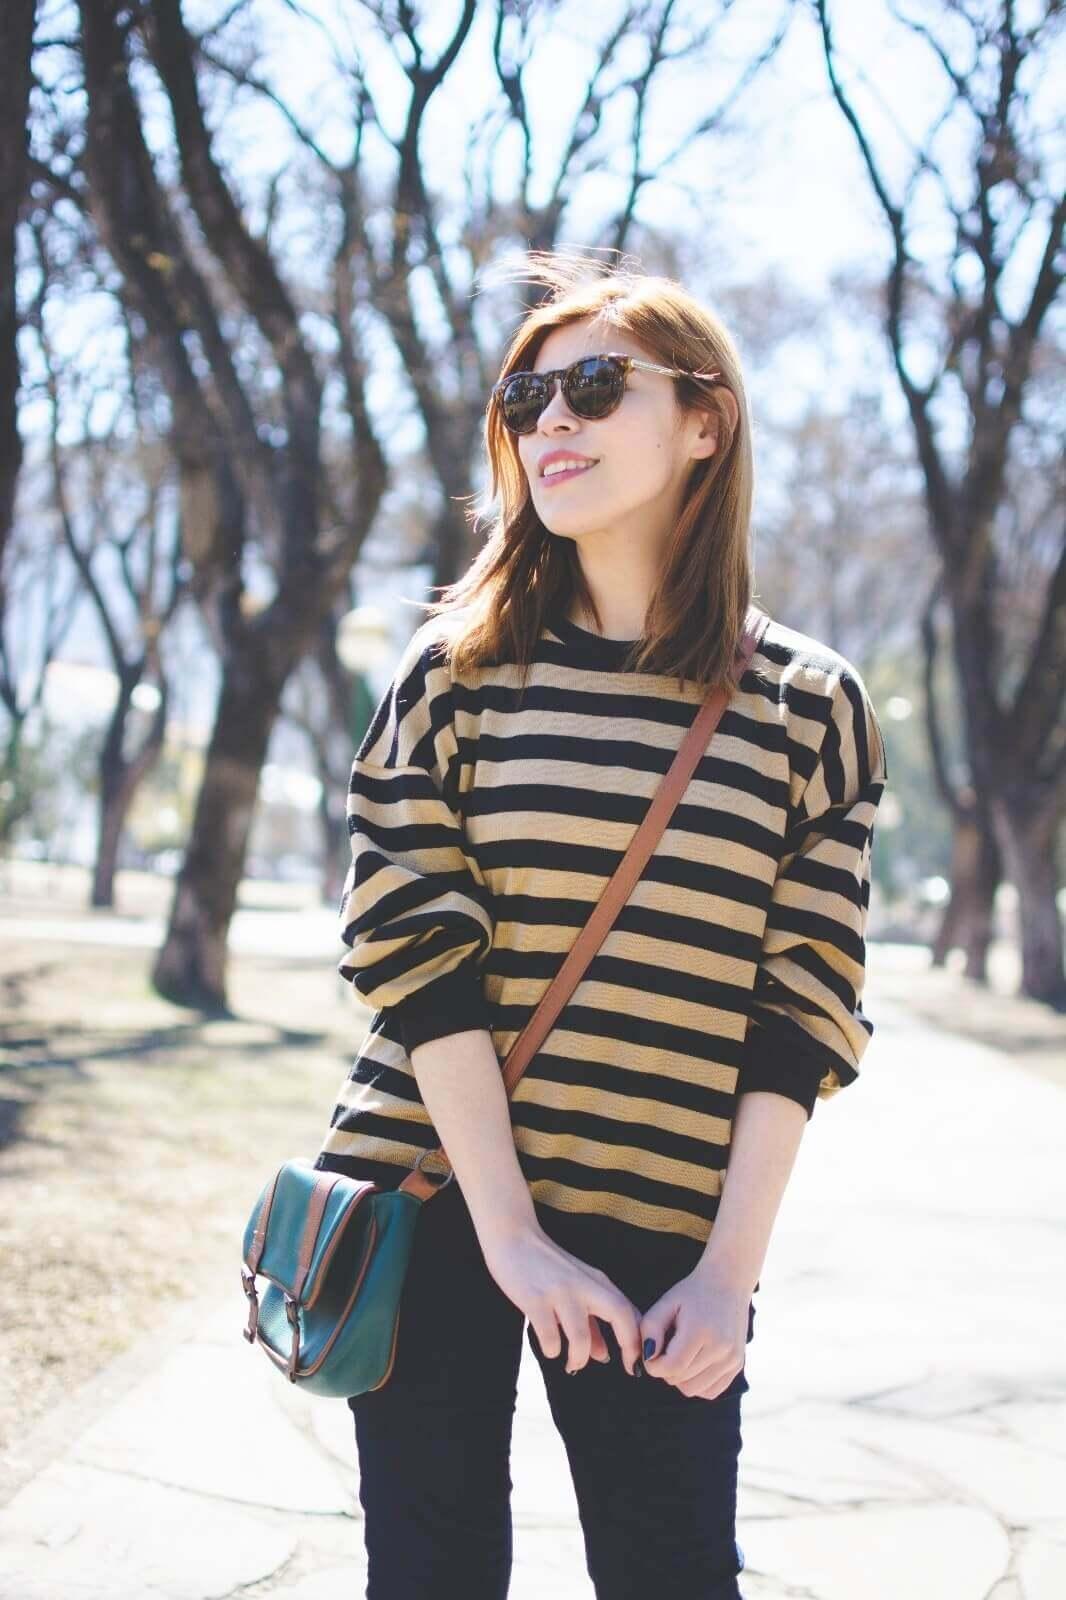 sammydress-block-heel-sandals-leopard-frame-light-brown-sammydress-sunglasses-deborah-ferrero-style-by-deb-streetstyle-salta-striped-sweater-fall2016-trends15